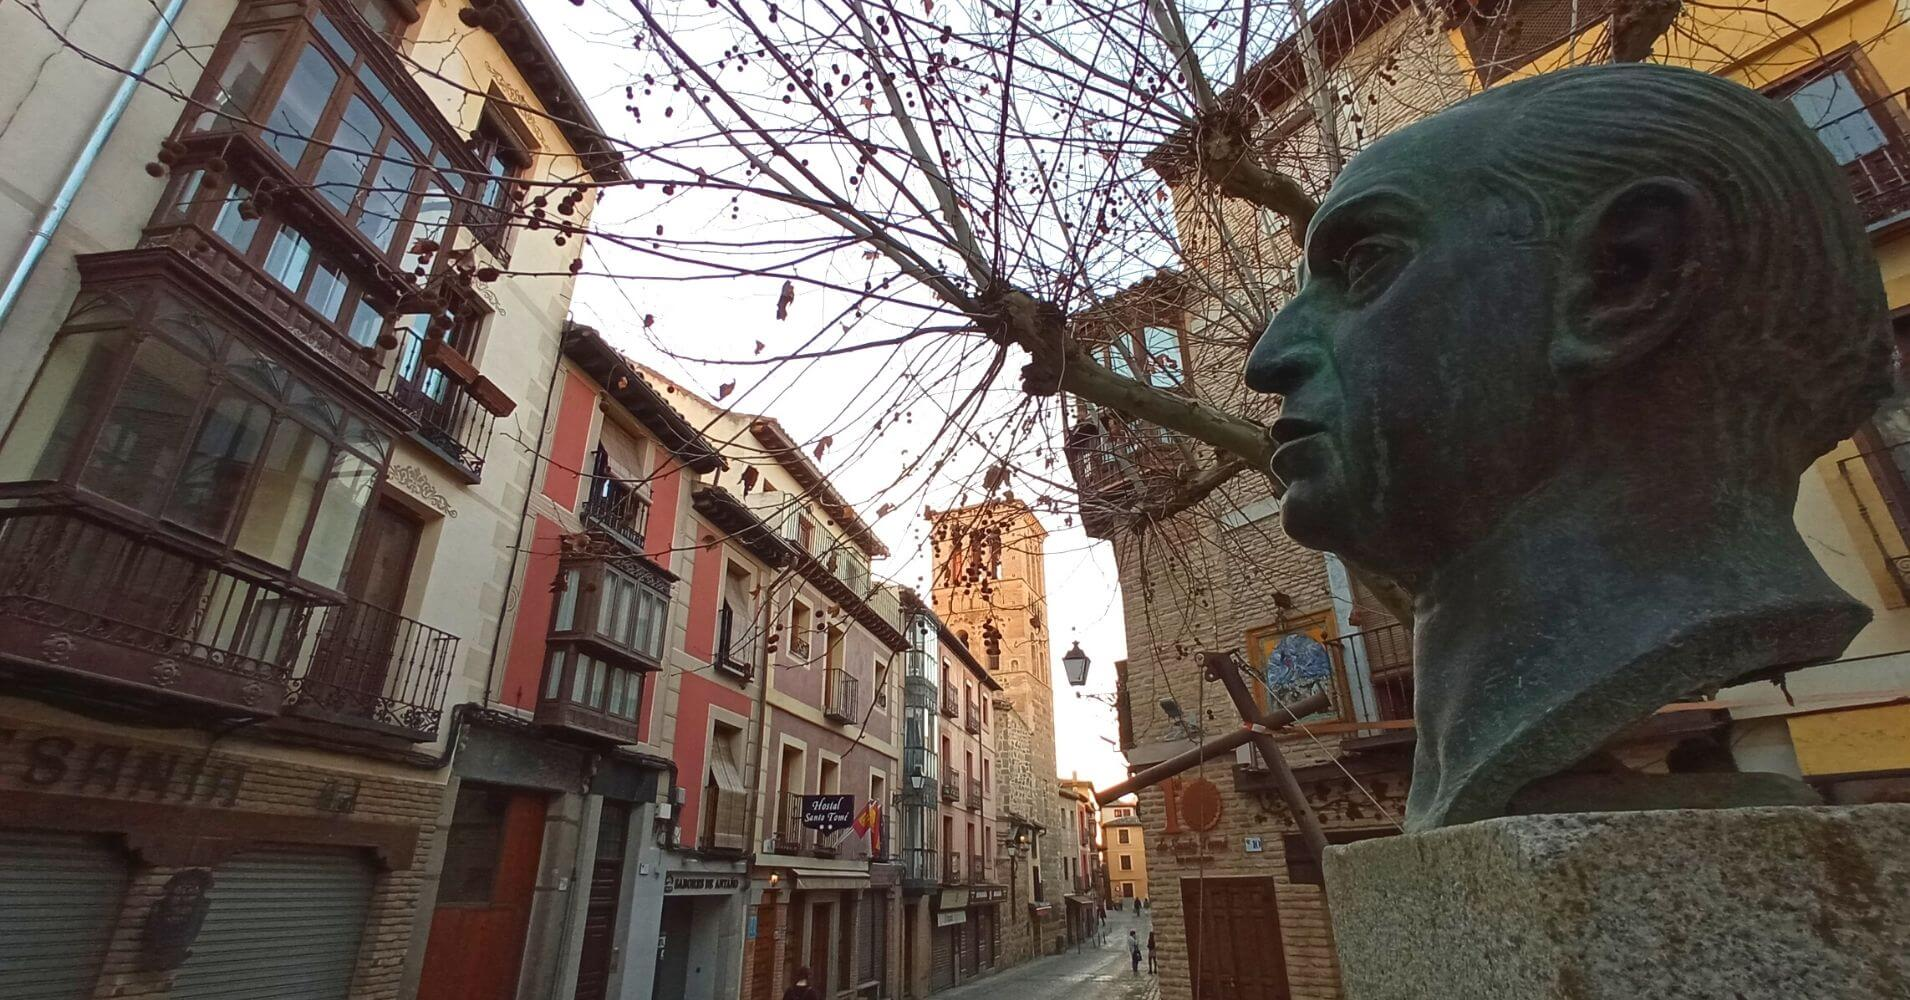 Calle de Santo Tomé. Estatua del Doctor Marañón. Toledo, Castilla La Mancha.